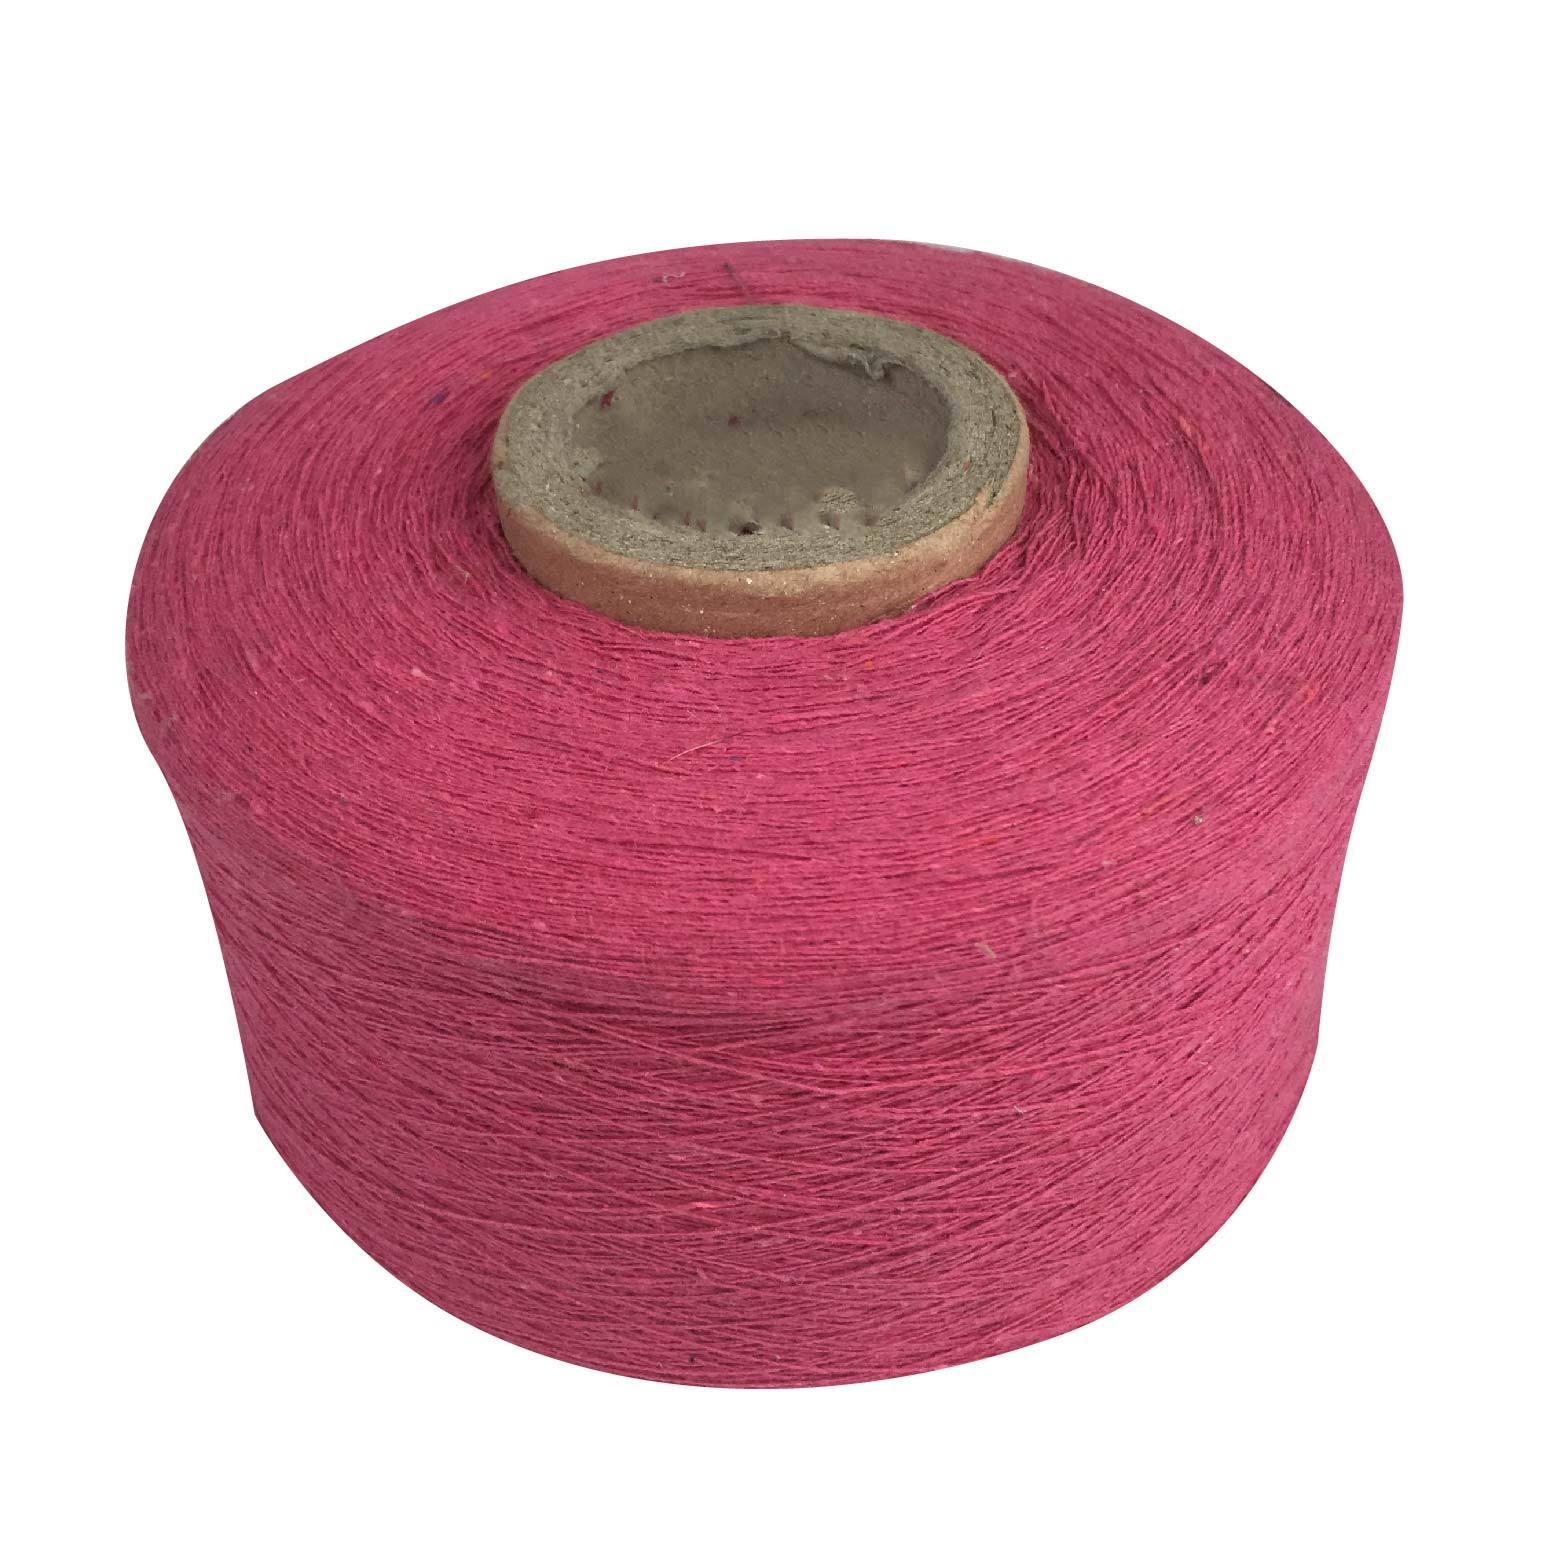 HUANSHENG Core spun yarn red single strand 21 count-40 count 21s flame retardant yarn knitted cotton